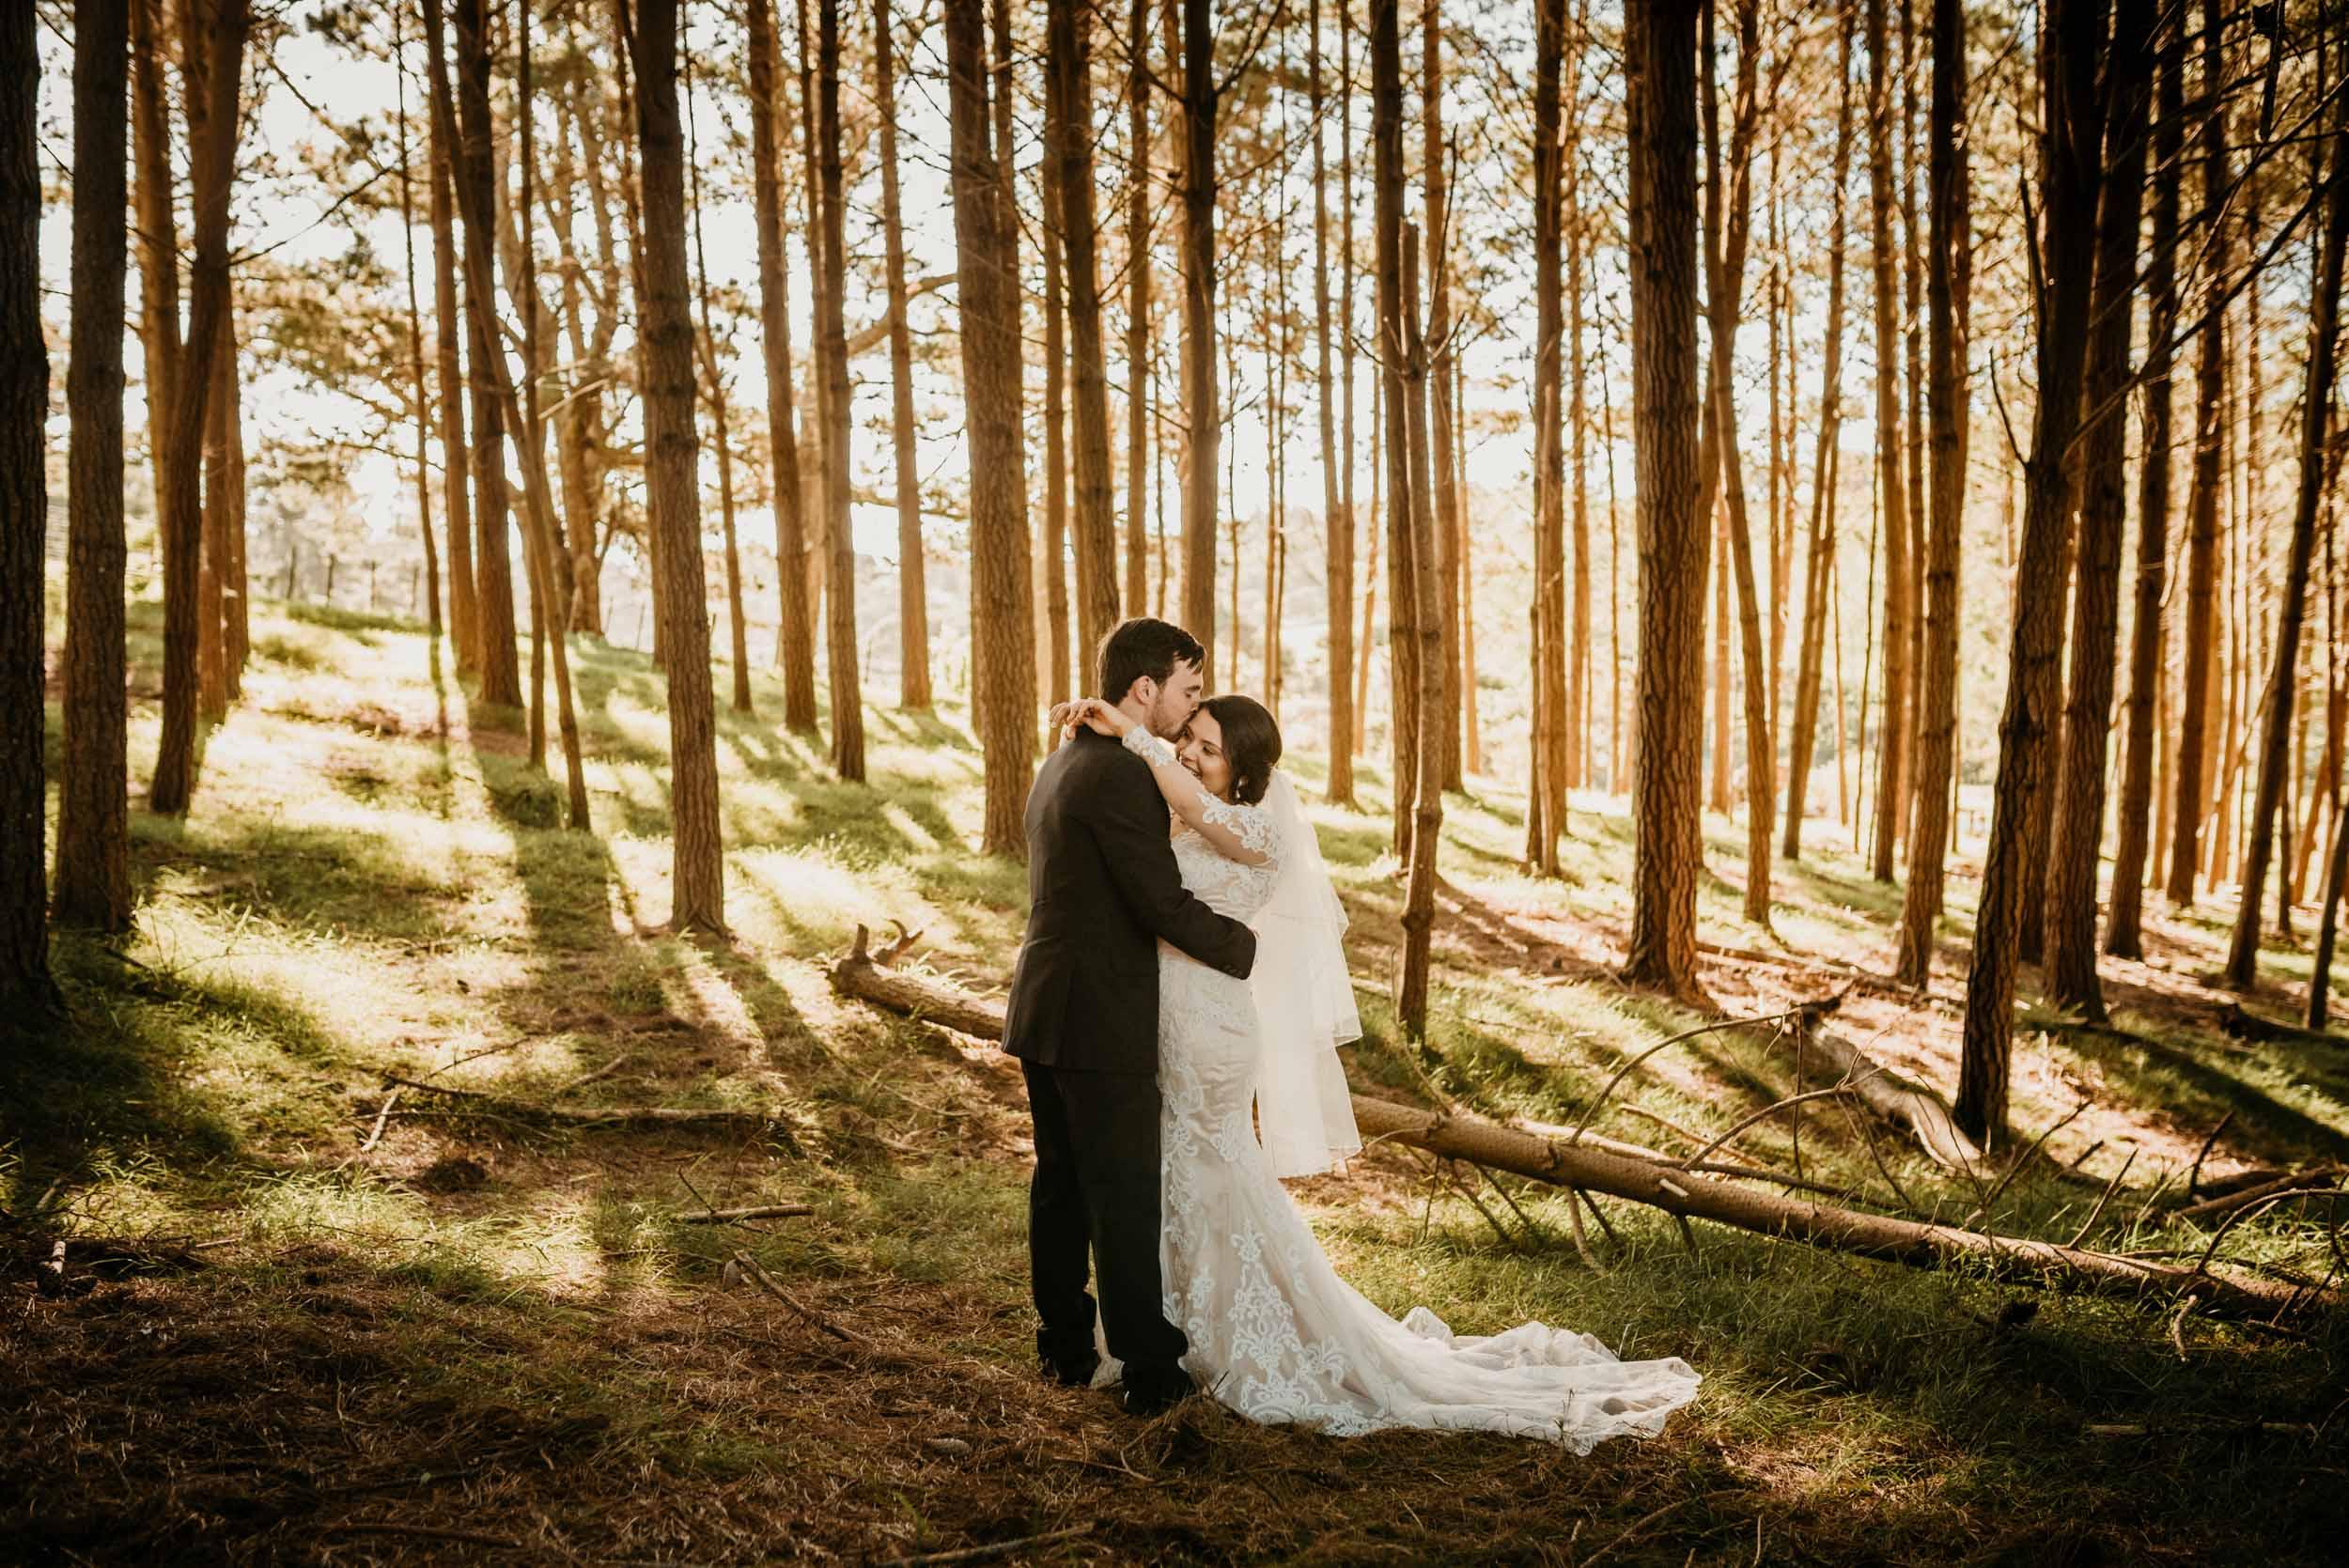 The Raw Photographer - Cairns Wedding Photographer - New Zealand Destination Photography - Travel - Australian-15.jpg